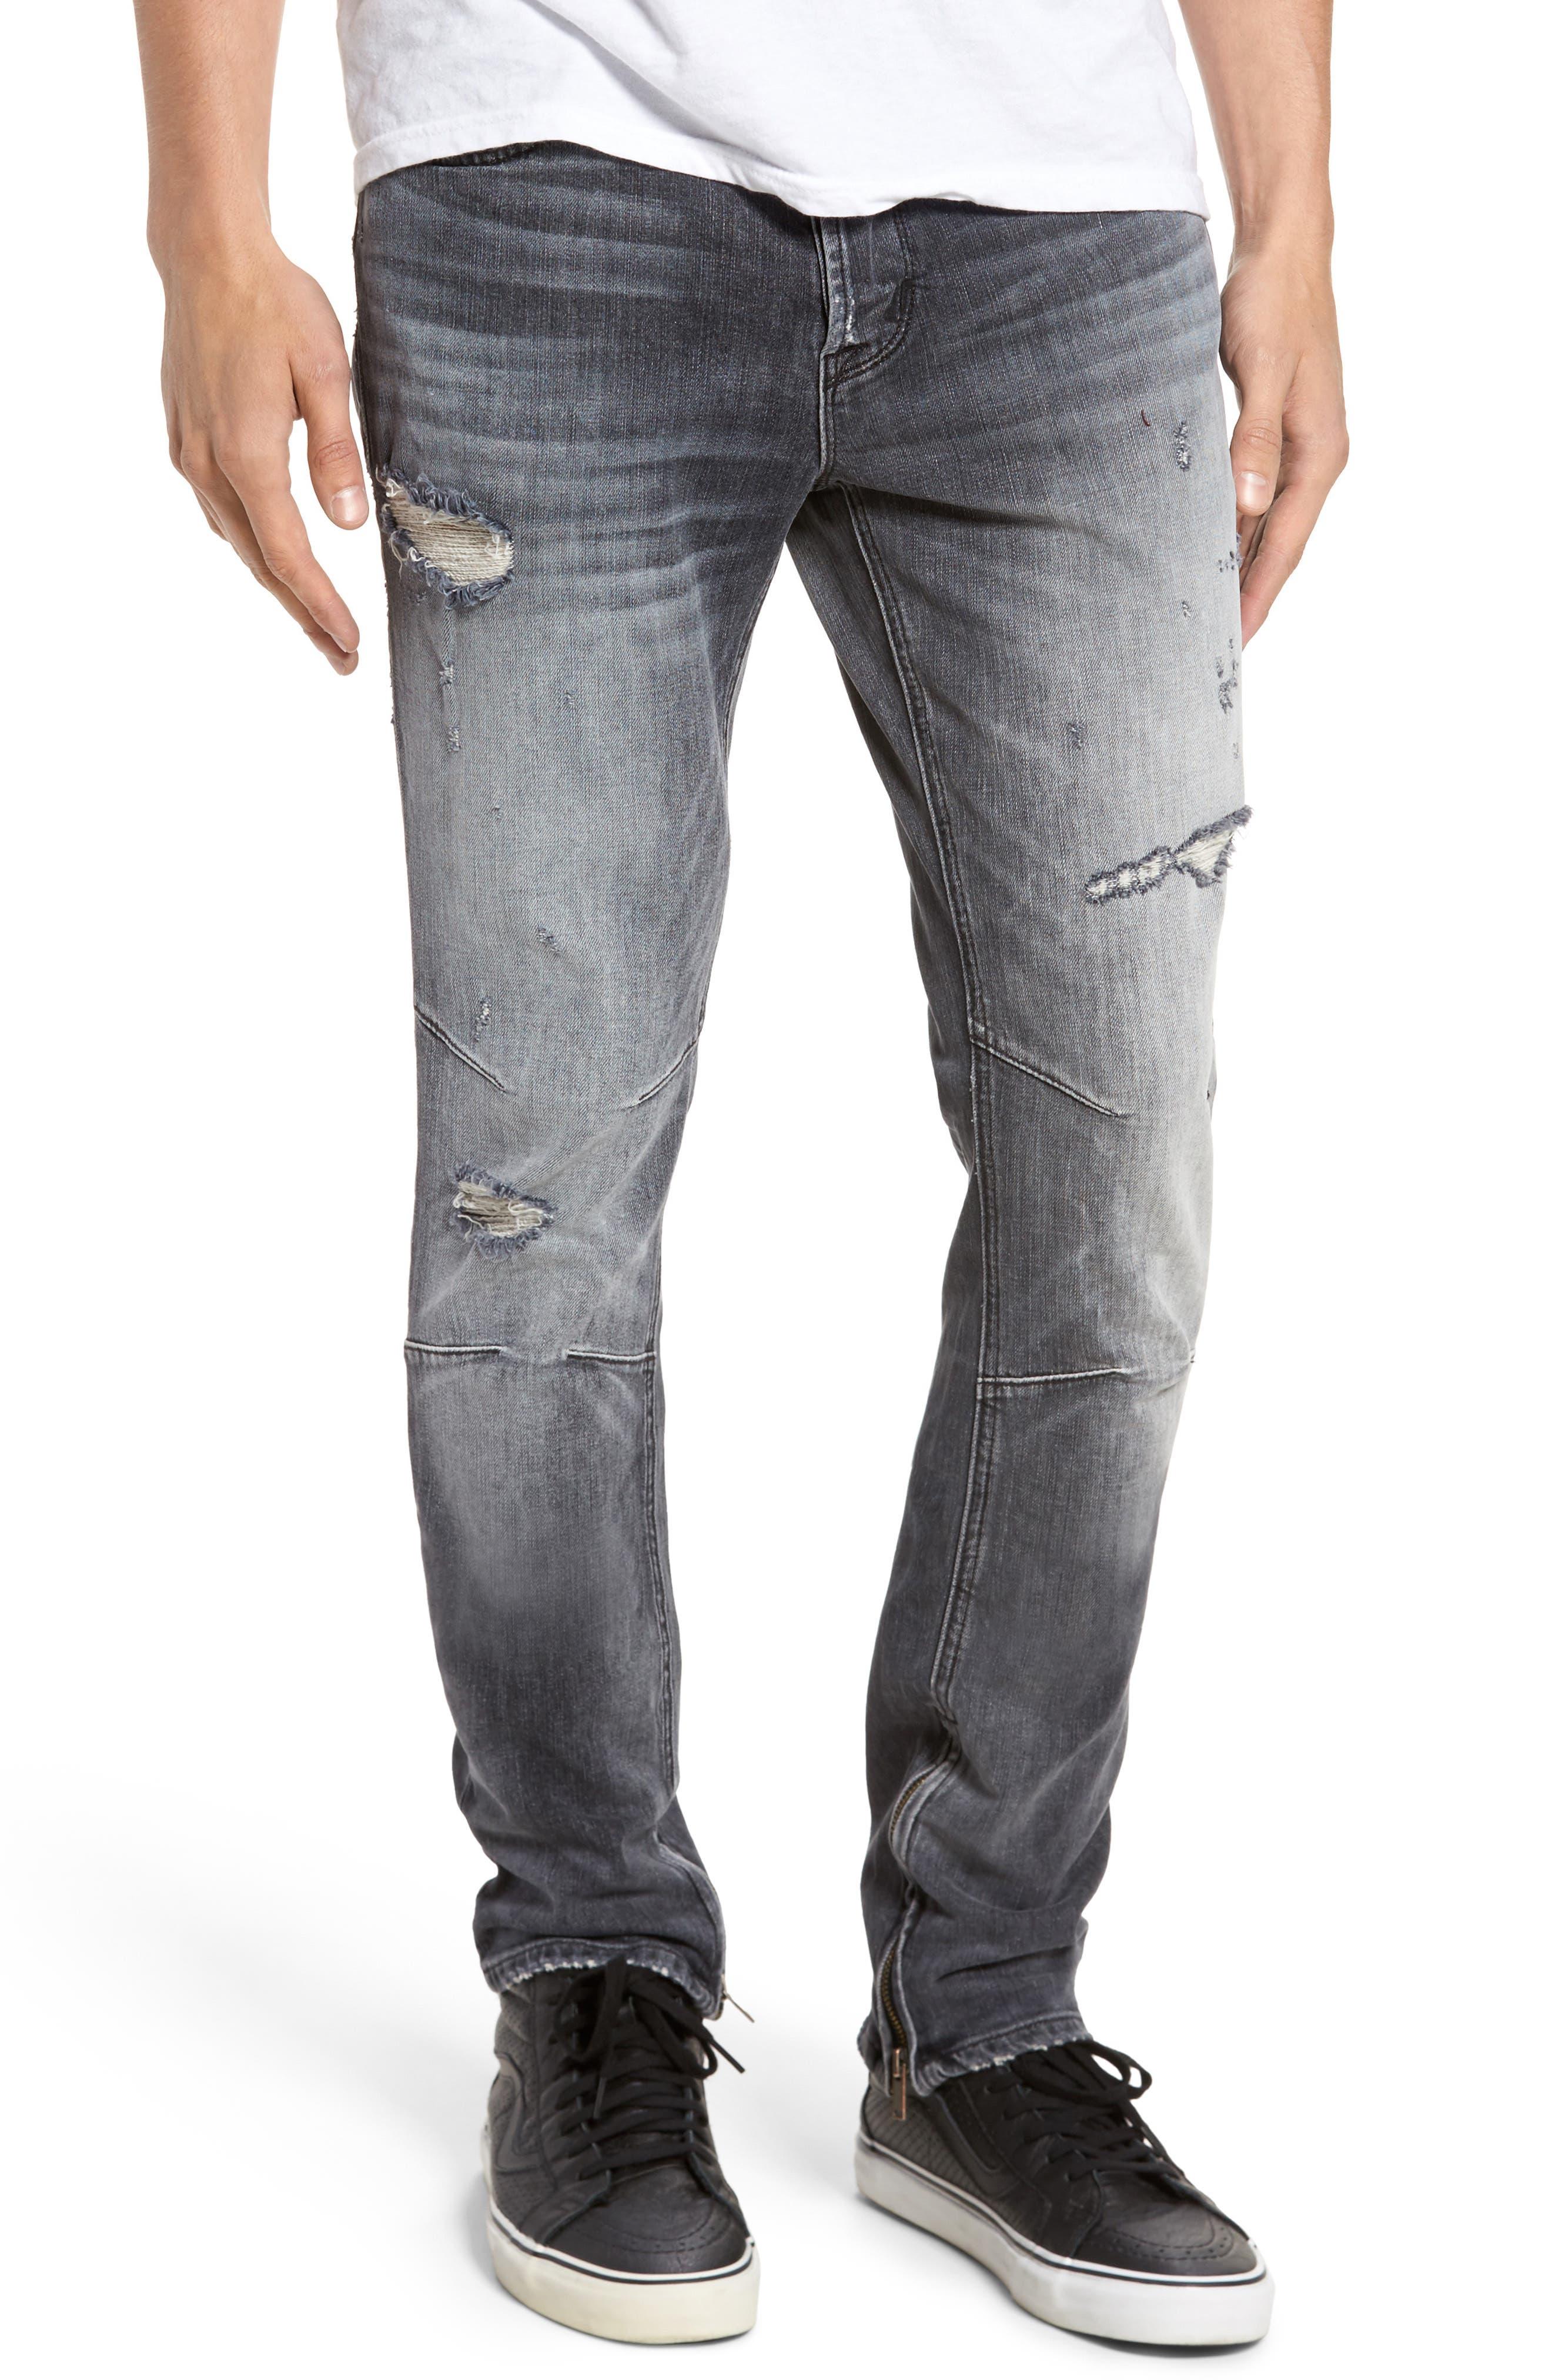 Alternate Image 1 Selected - Hudson Jeans Vaughn Skinny Fit Jeans (Violate)